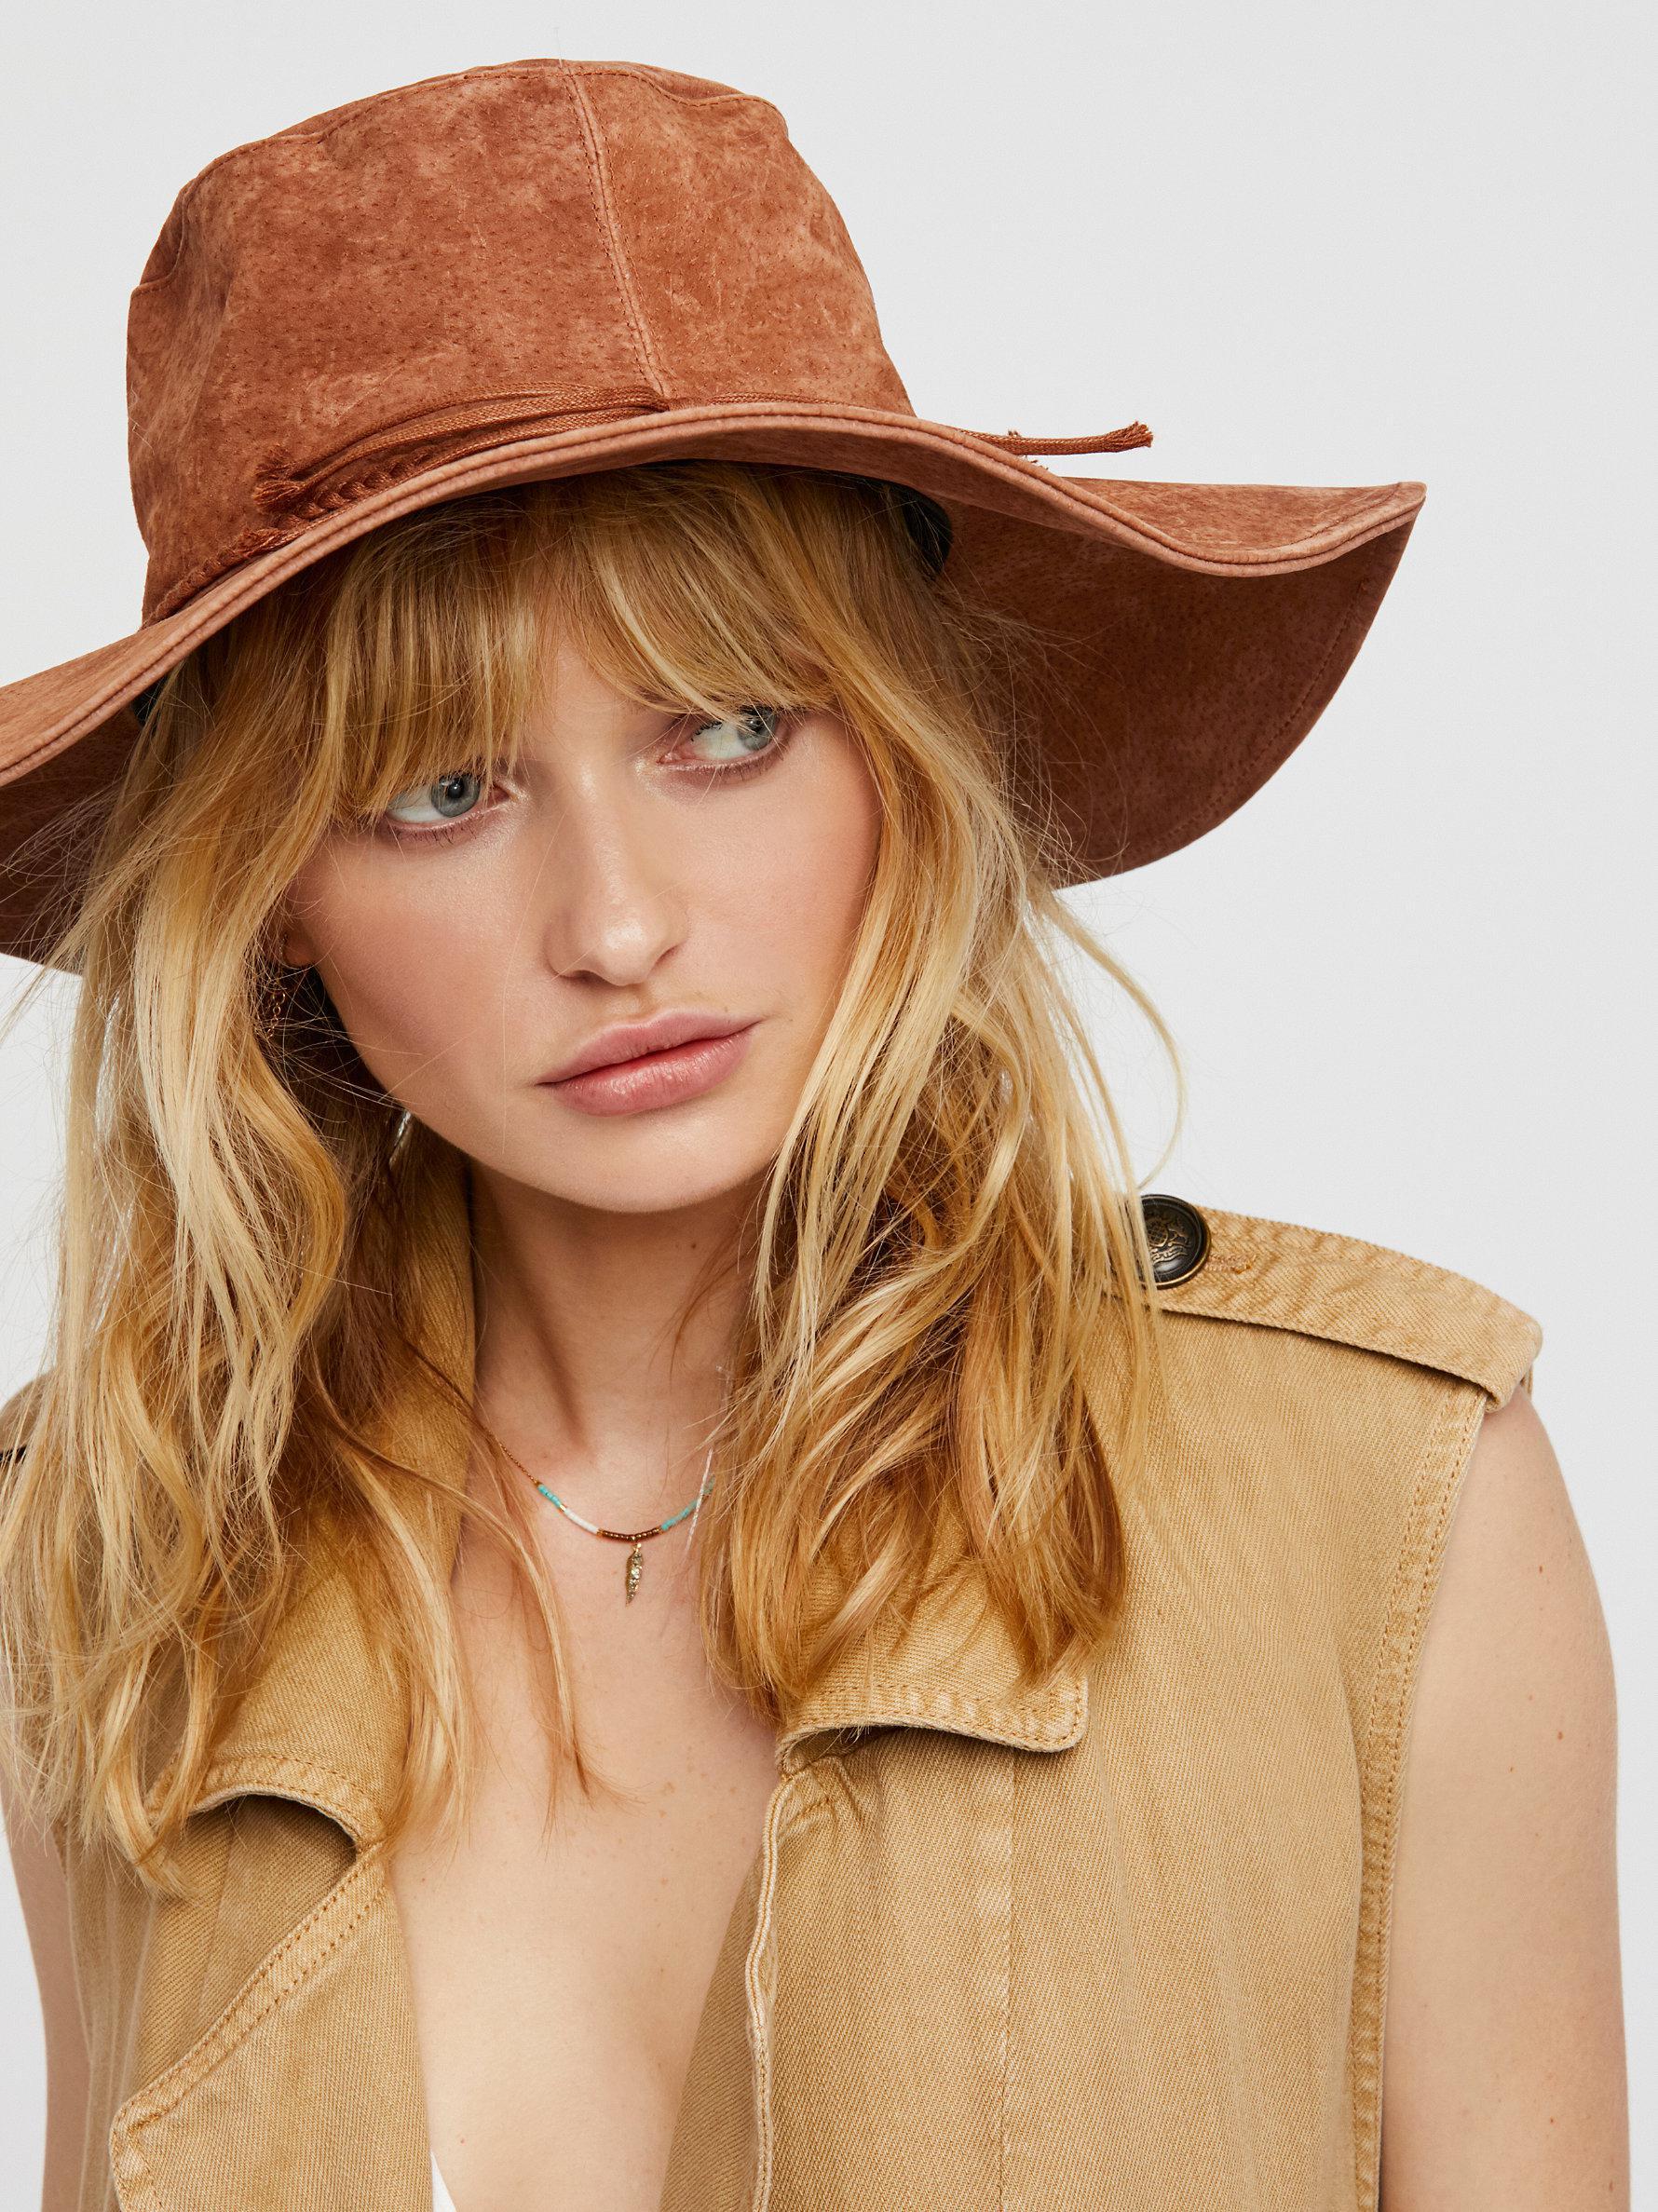 Free People Woodstock Suede Floppy Hat in Brown - Lyst 61d3a601d39